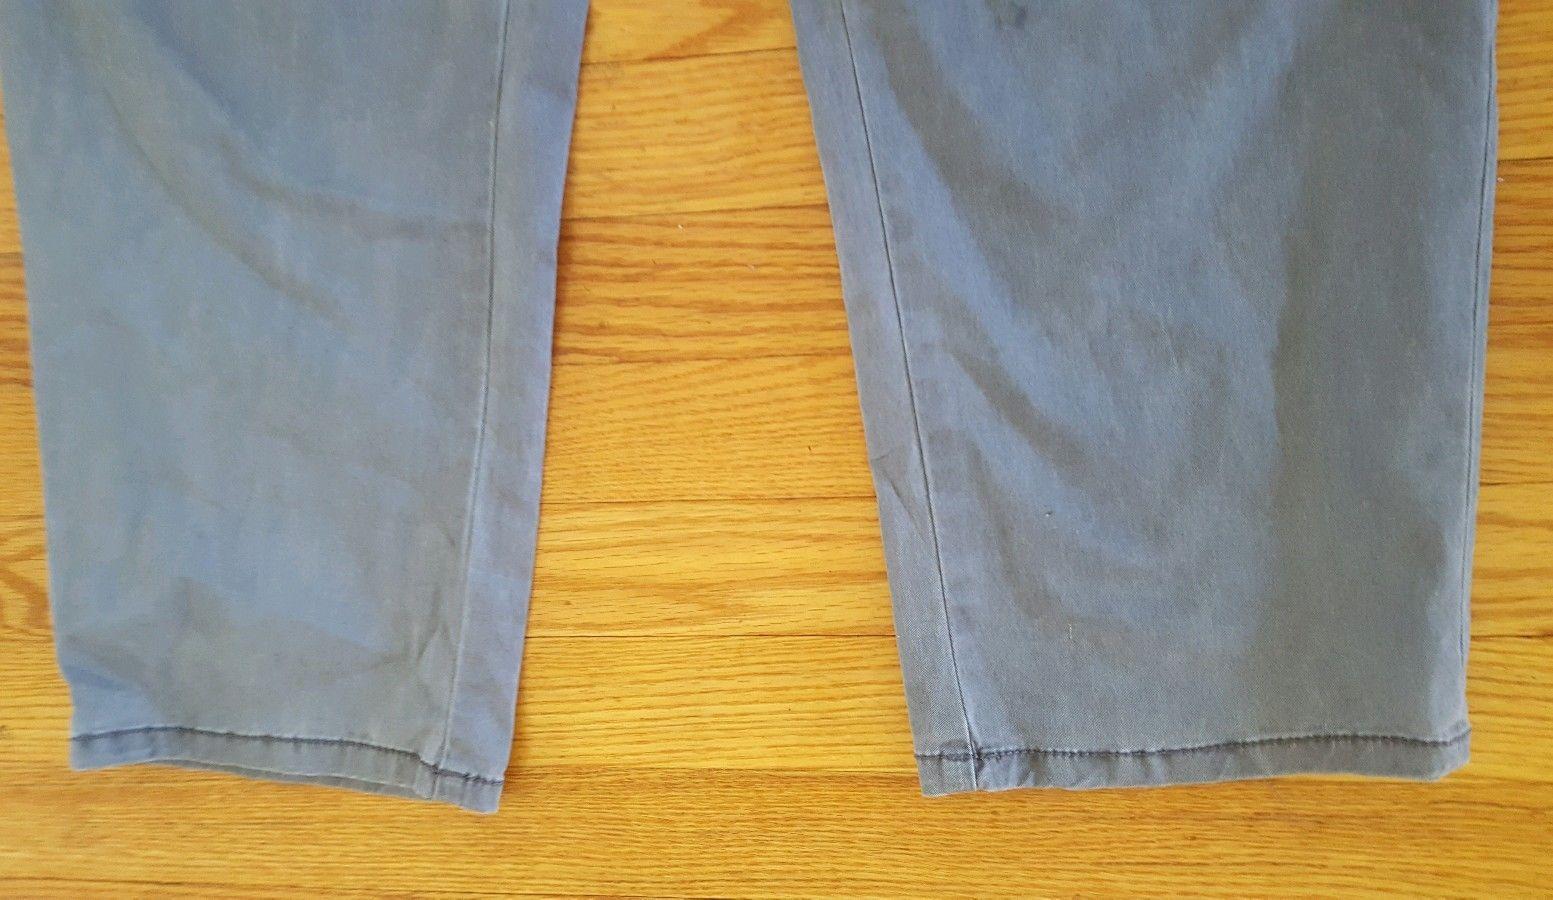 Lane Bryant Women/'s Yellow Chinos Khakis Pants Size 26